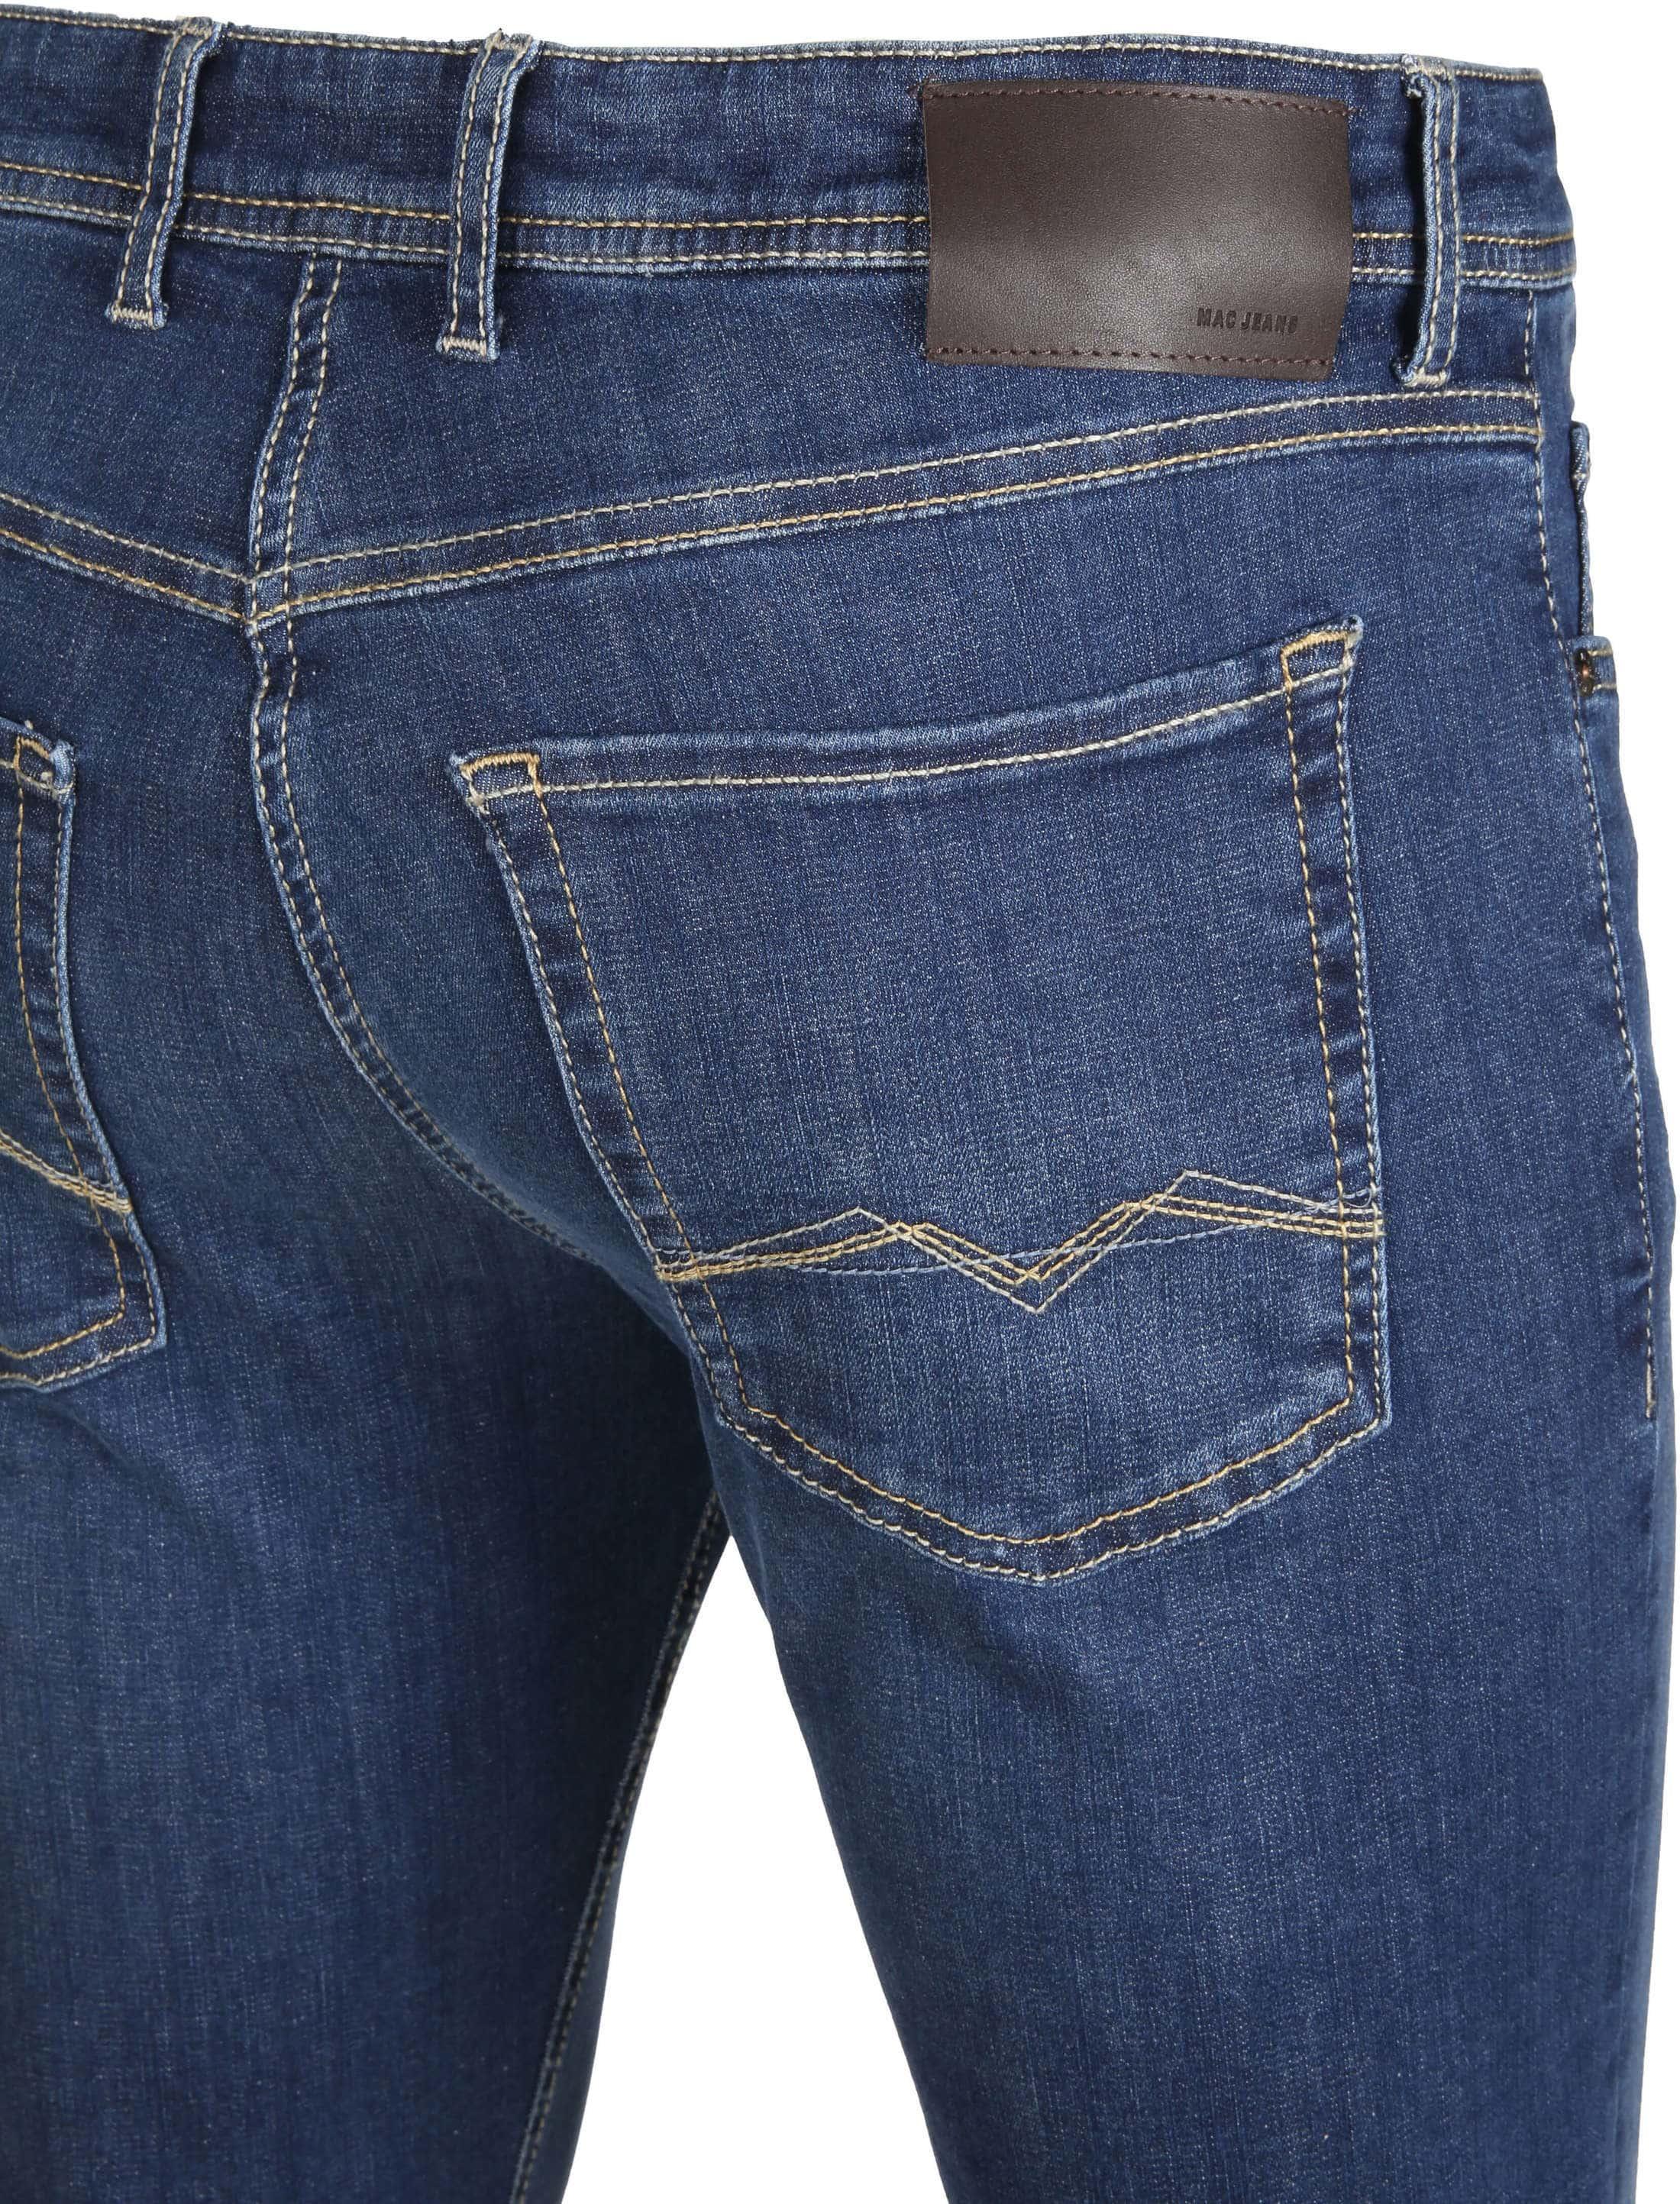 Mac Jeans Flexx H554 foto 1